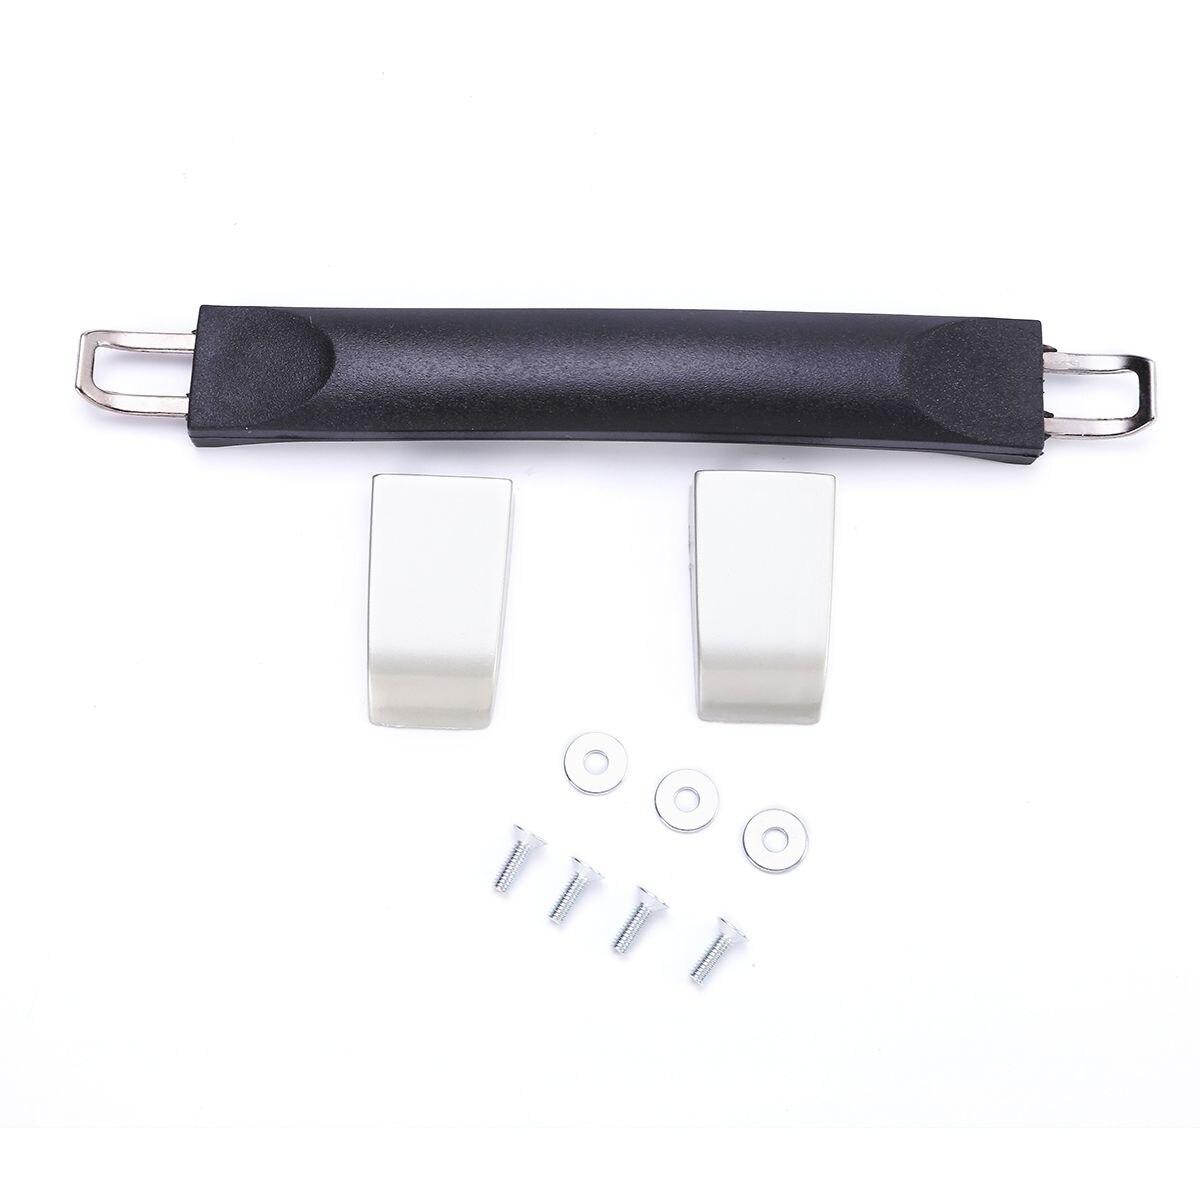 1 Set Luggage Case Handle Broken Replace Repair Tools Mayitr Suitcase Spare Strap Grip Black+Silver